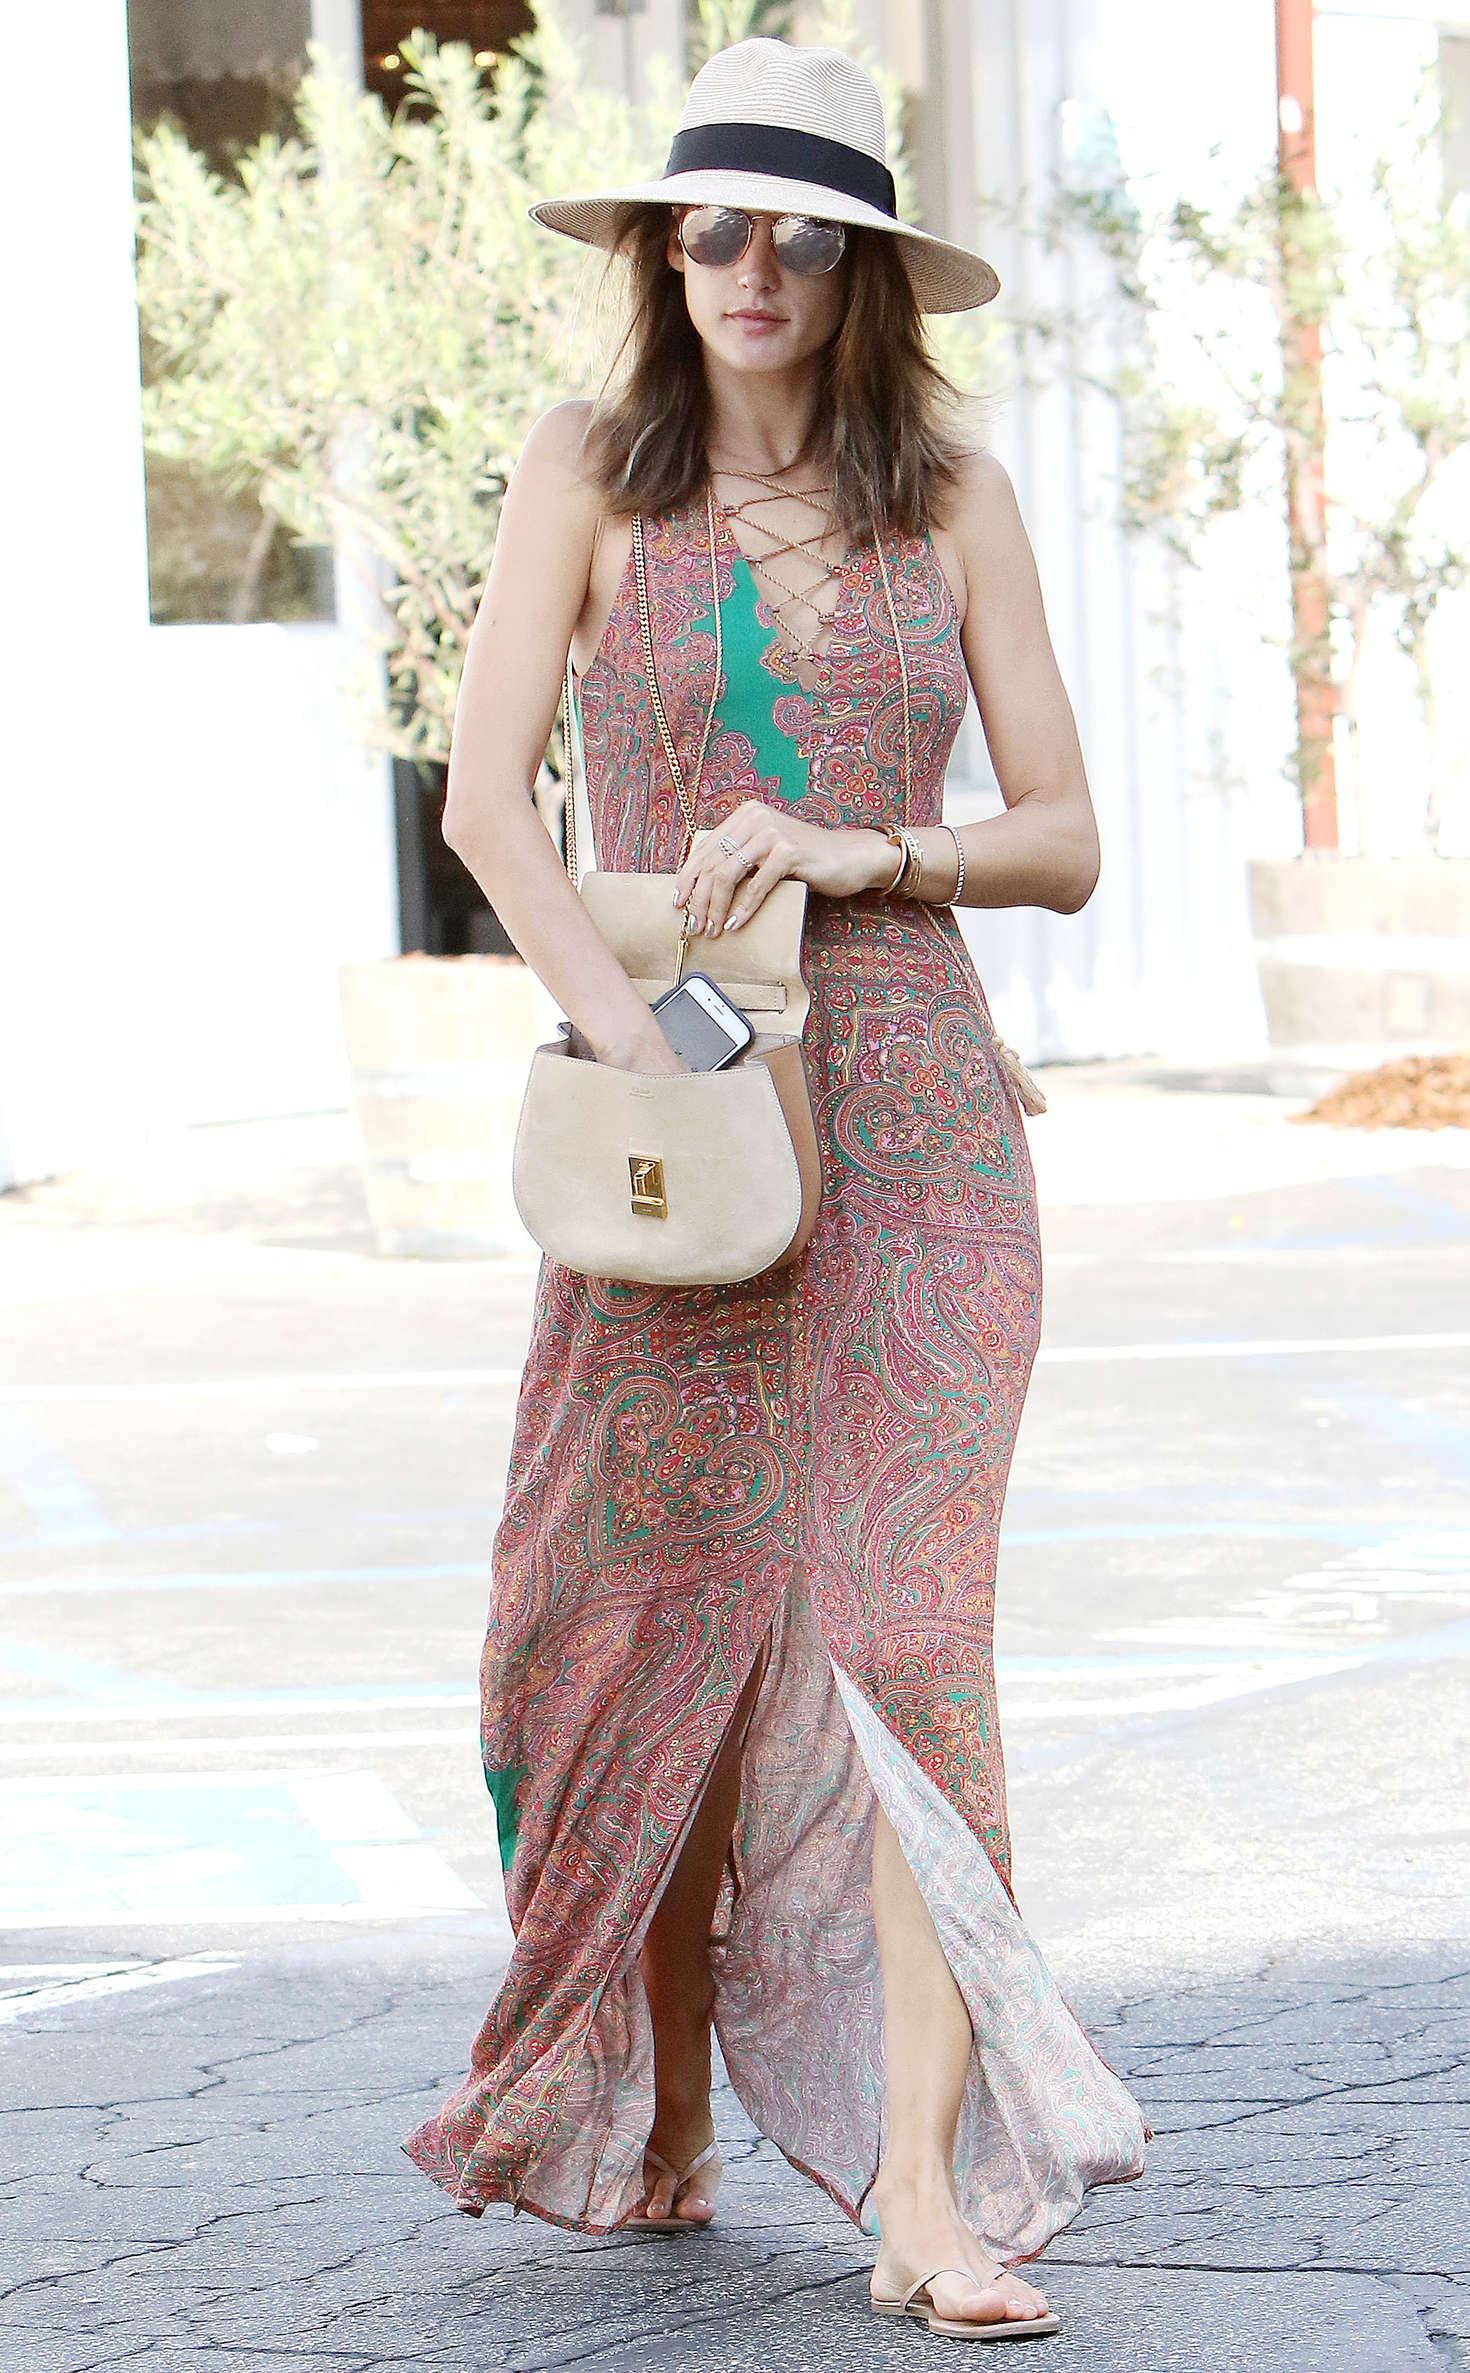 Alessandra Ambrosio 2016 : Alessandra Ambrosio in Long Summer Dress -10